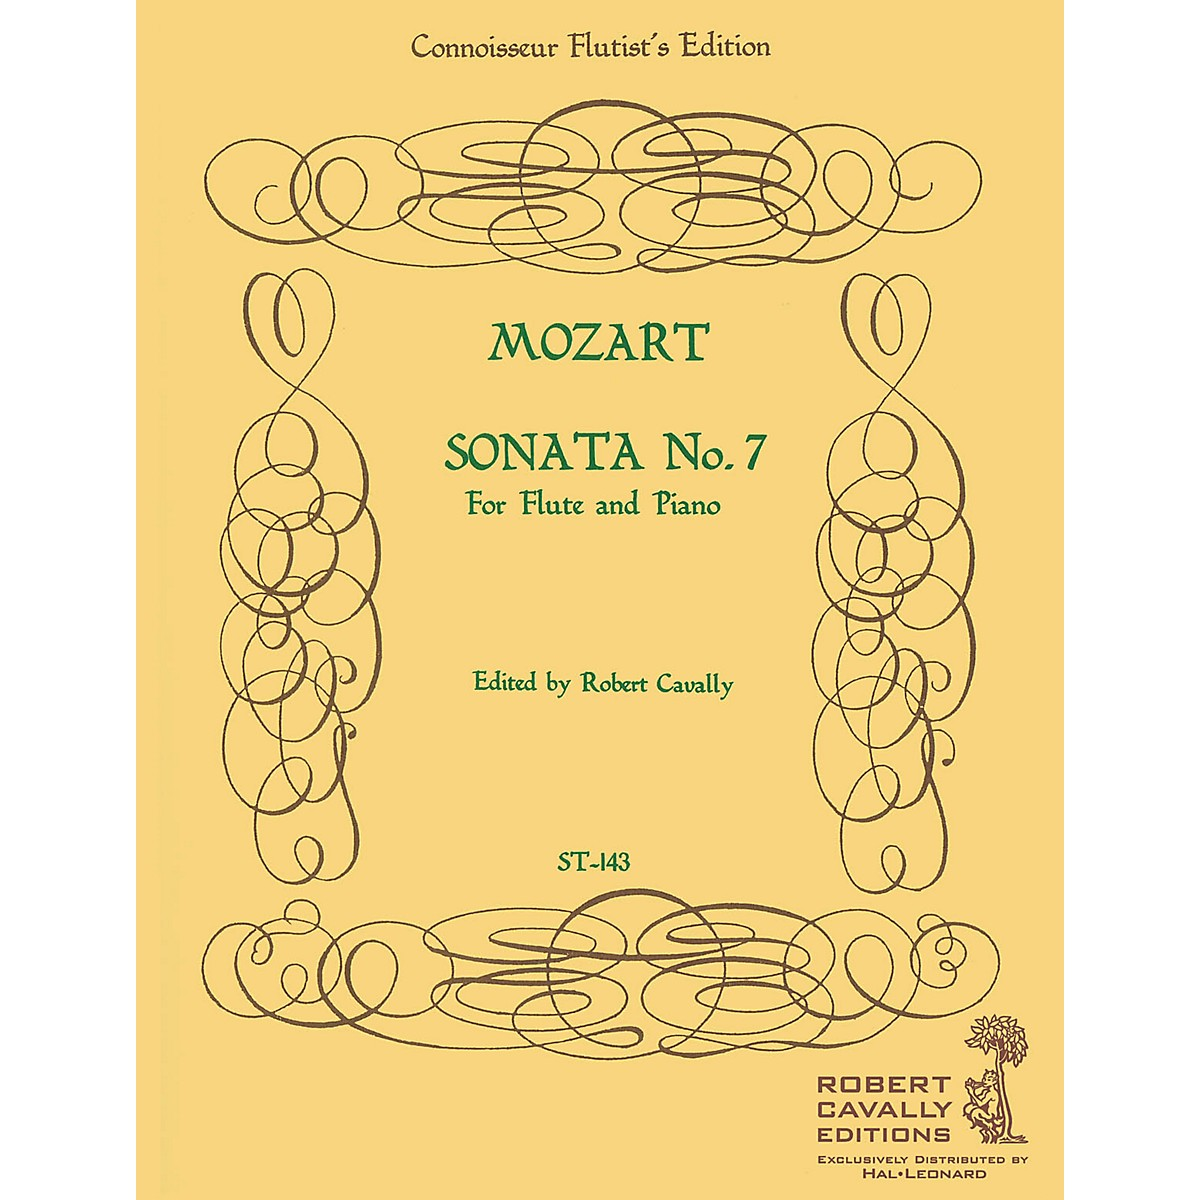 Cavally Editions Sonata No. 7 in Eb (Connoisseur Flutist's Edition) Robert Cavally Editions Series by Robert Cavally